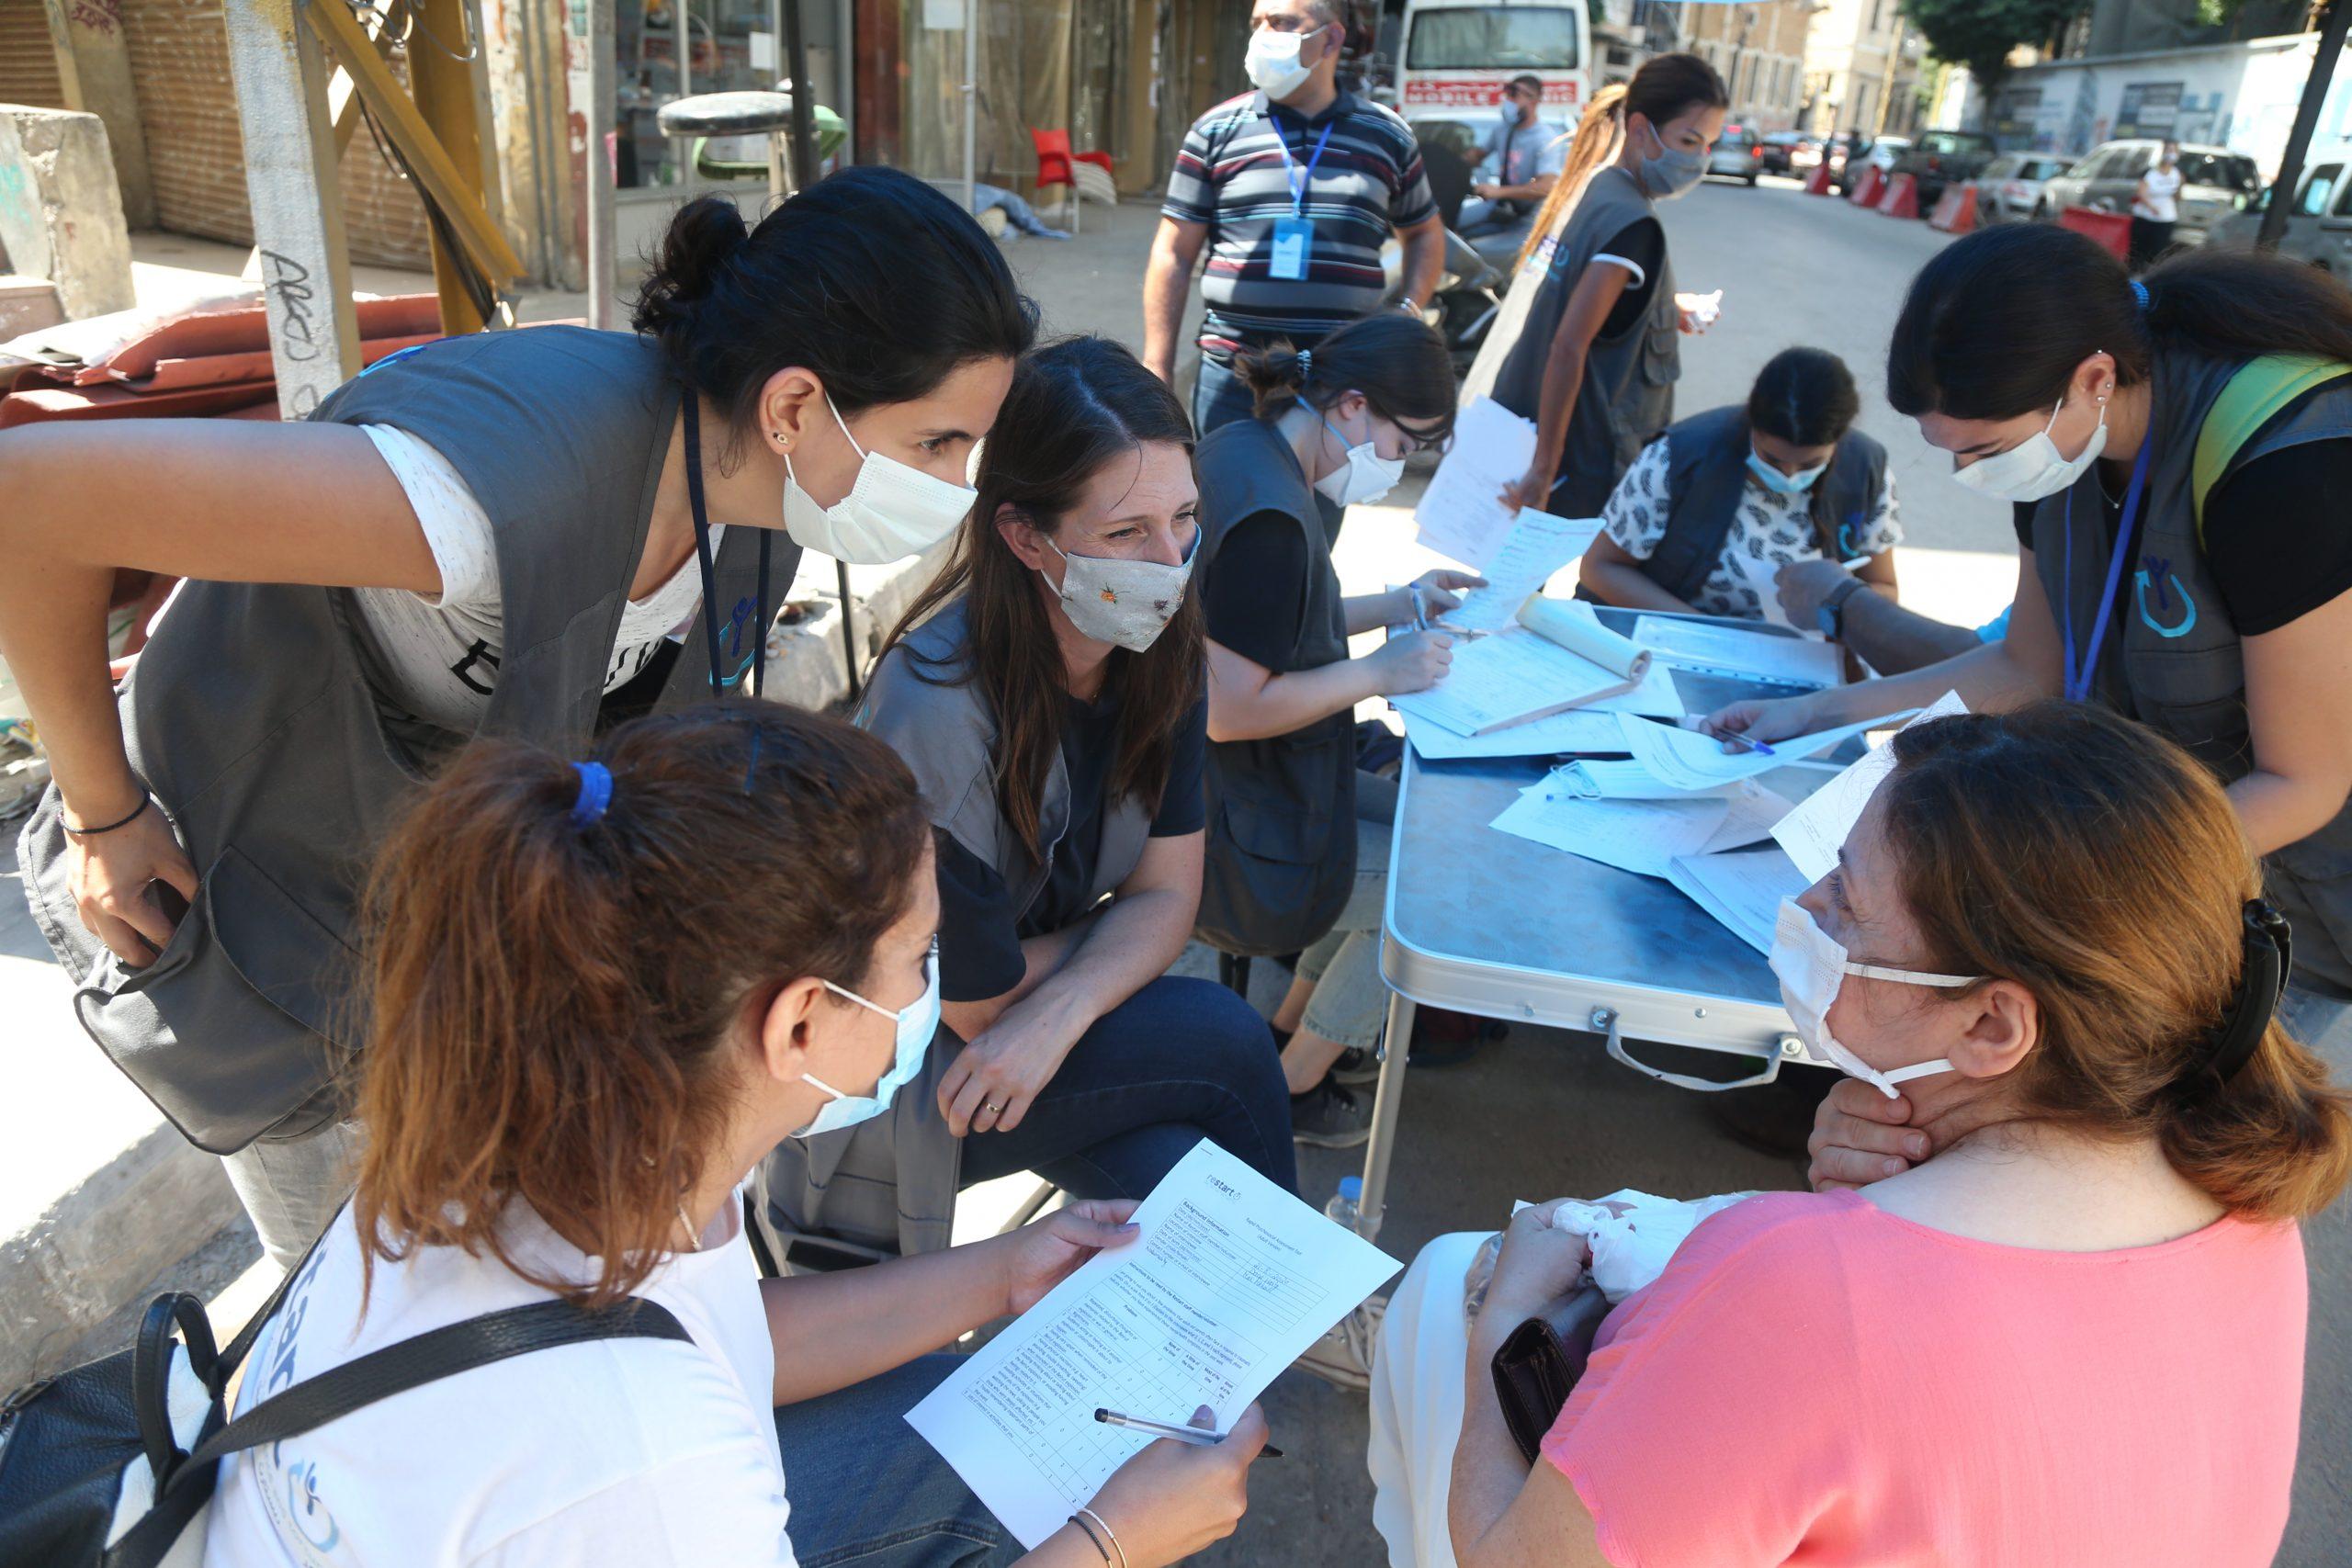 Dealing with the Past Program/ Beirut Blast Response/ Restart organization/ Mar Mikhael, Beirut